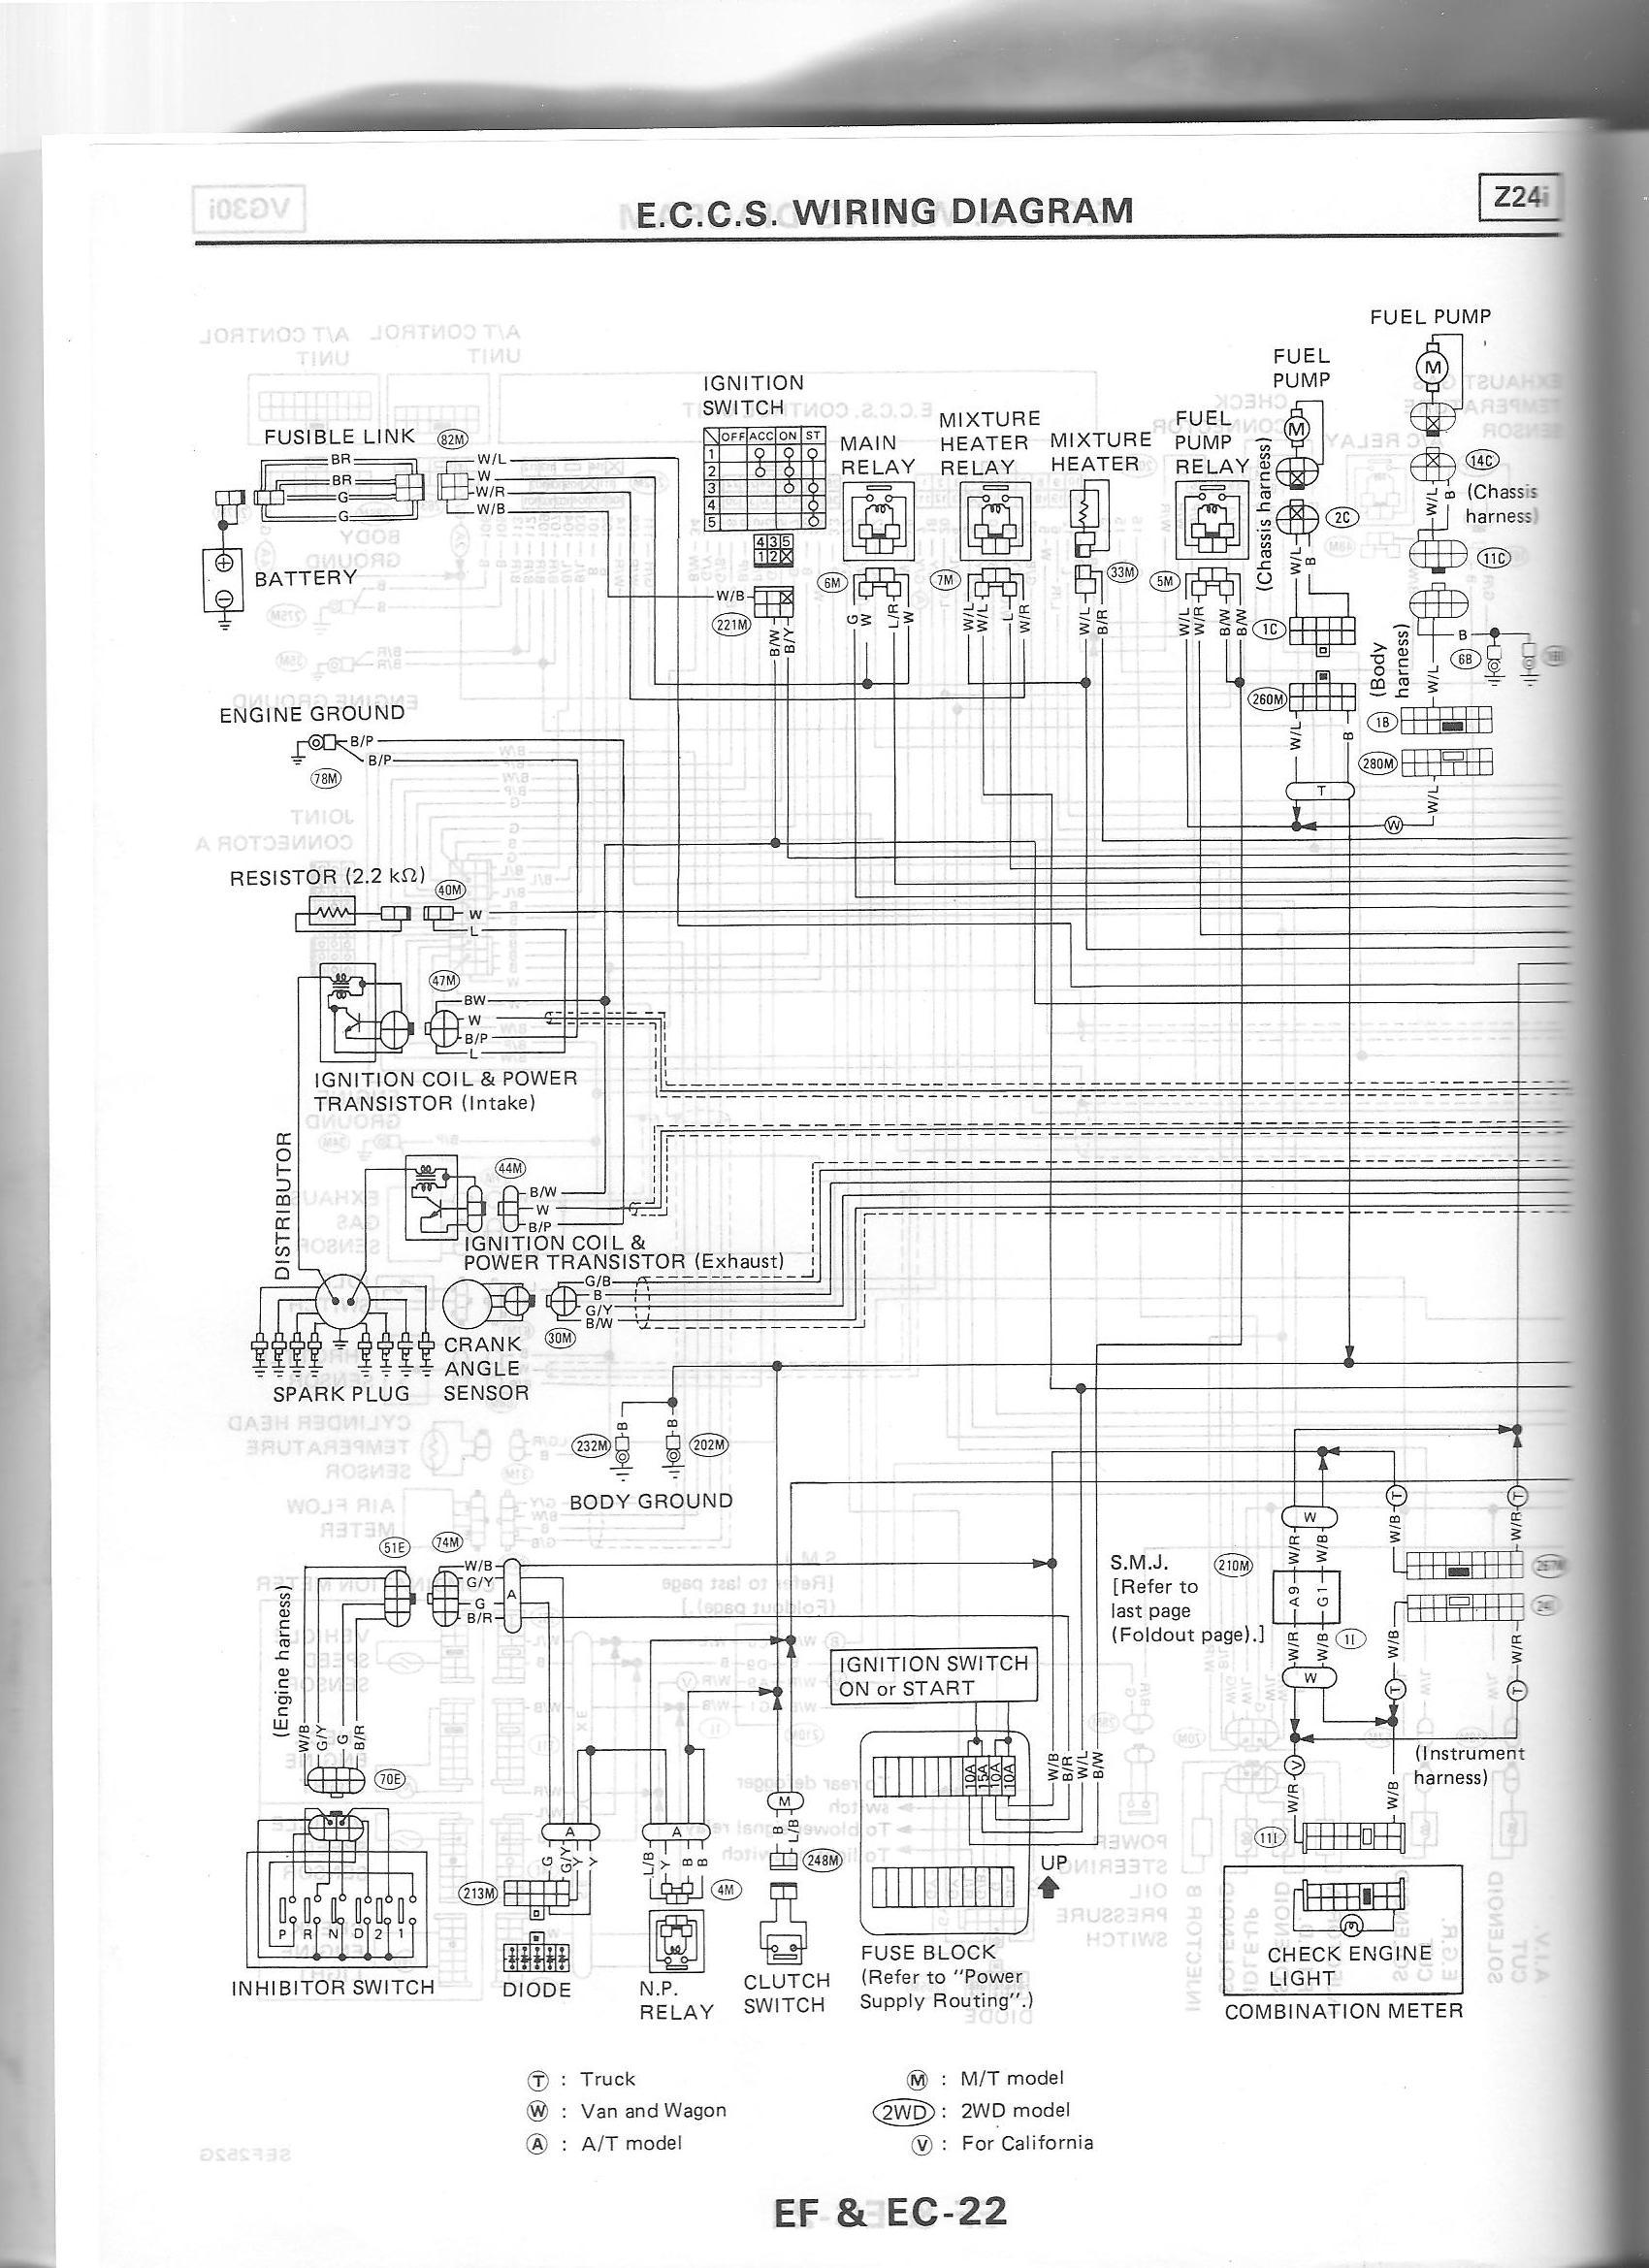 Pleasing Ka24De Ecu Pinout Diagram Wiring Diagram Photos For Help Your Wiring Cloud Rdonaheevemohammedshrineorg